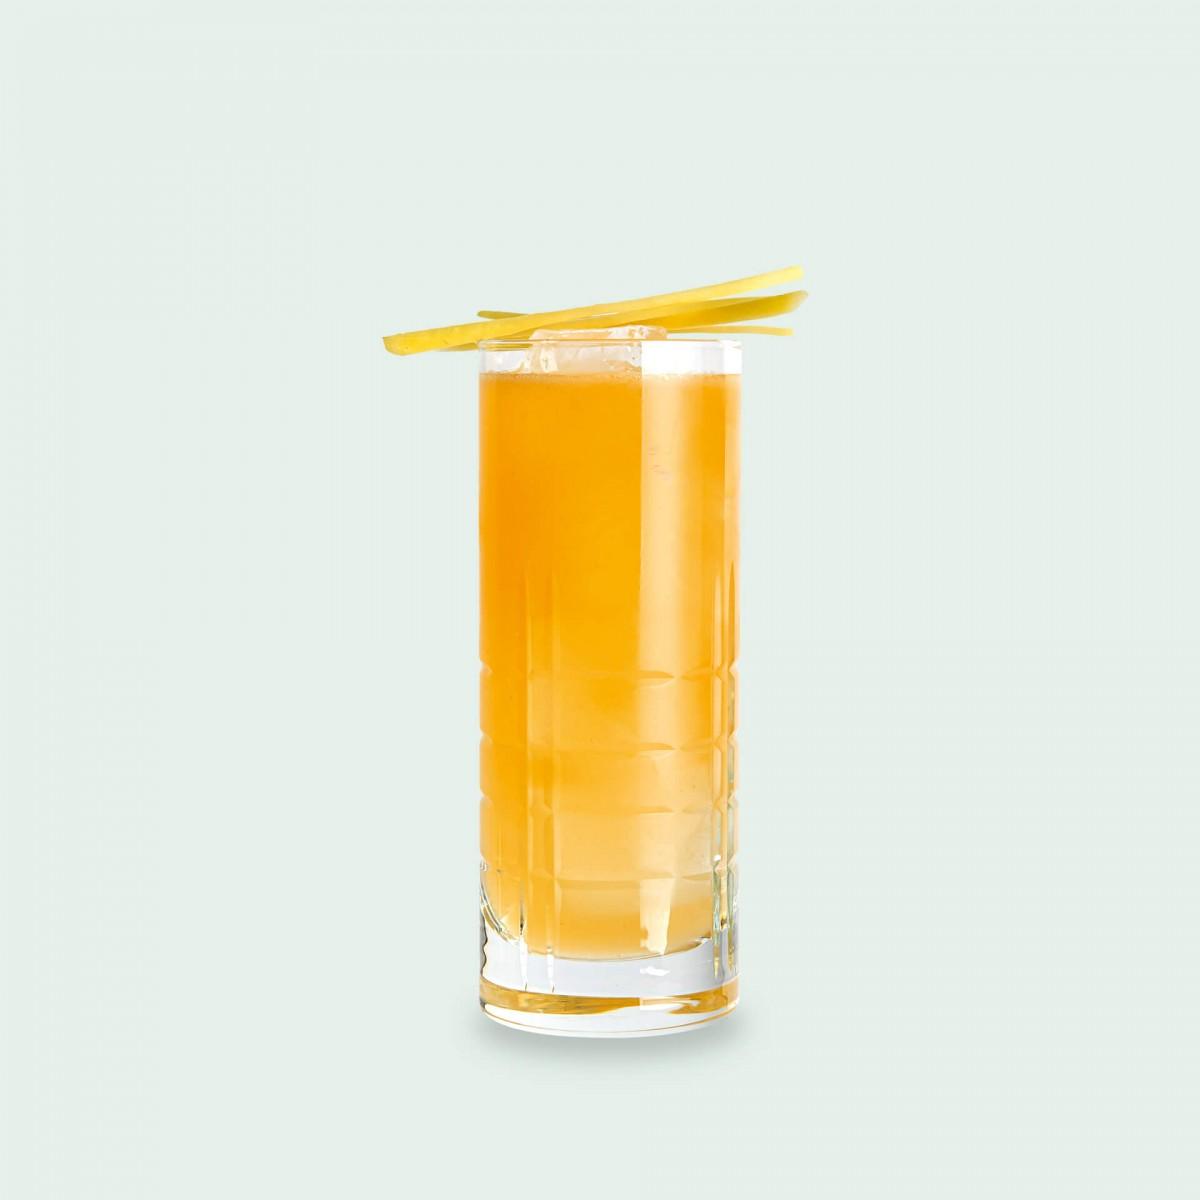 Fine Drinking - Tiki Style - Cocktail Set